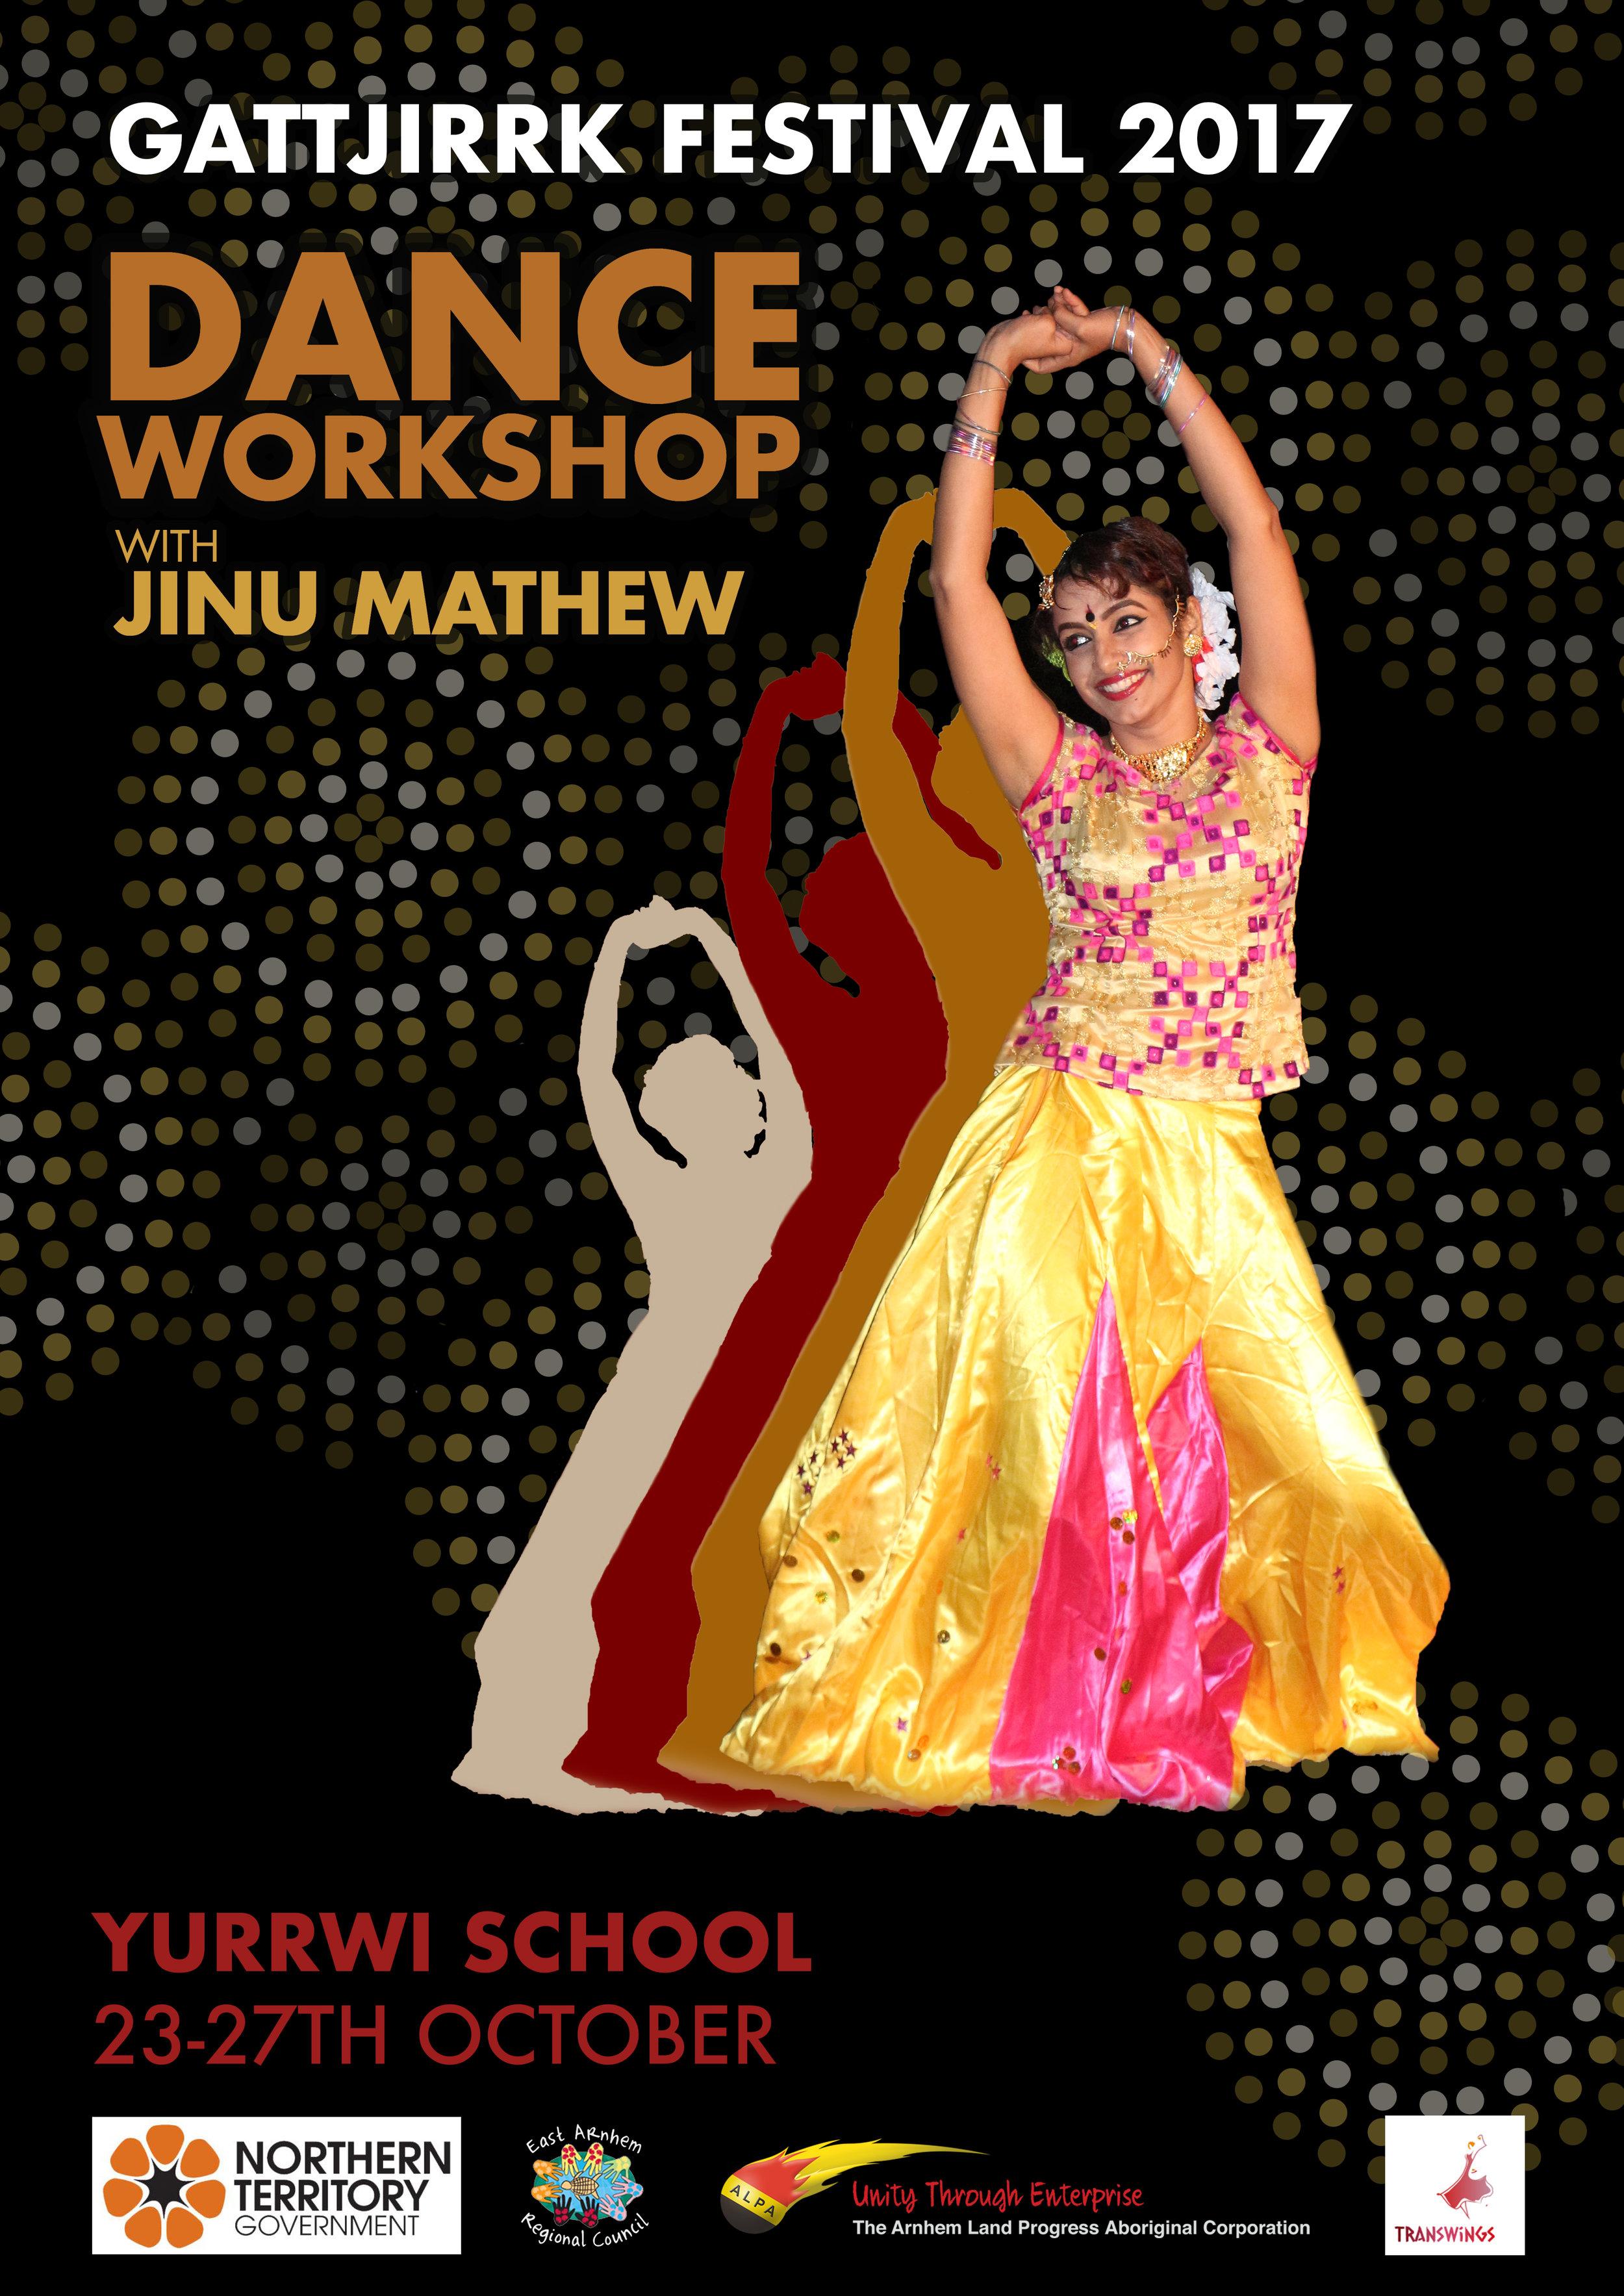 join in the fun - School workshops!